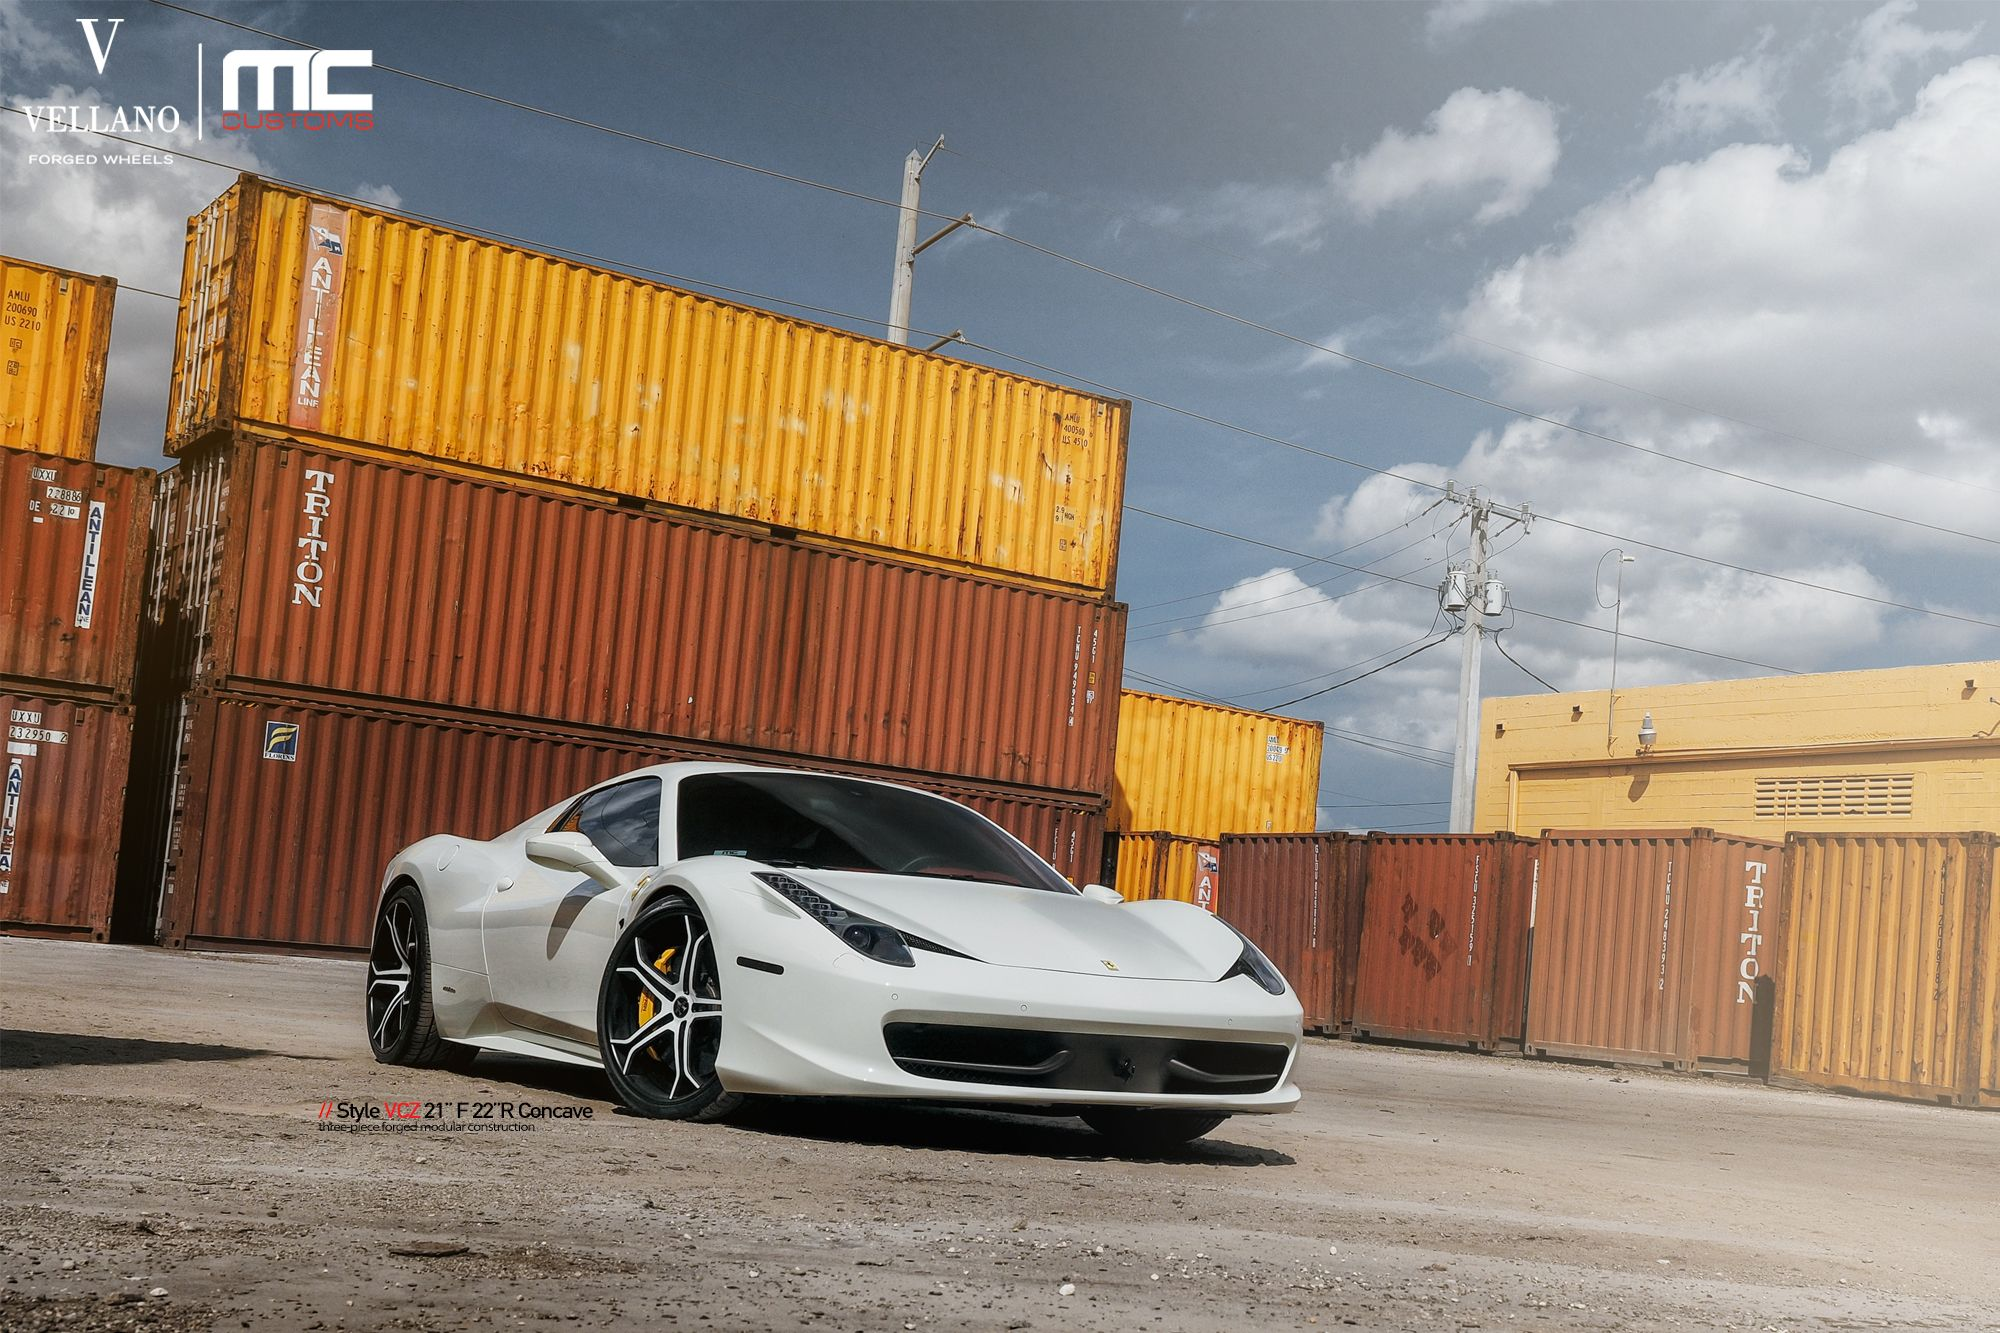 Stunning Ferrari 458